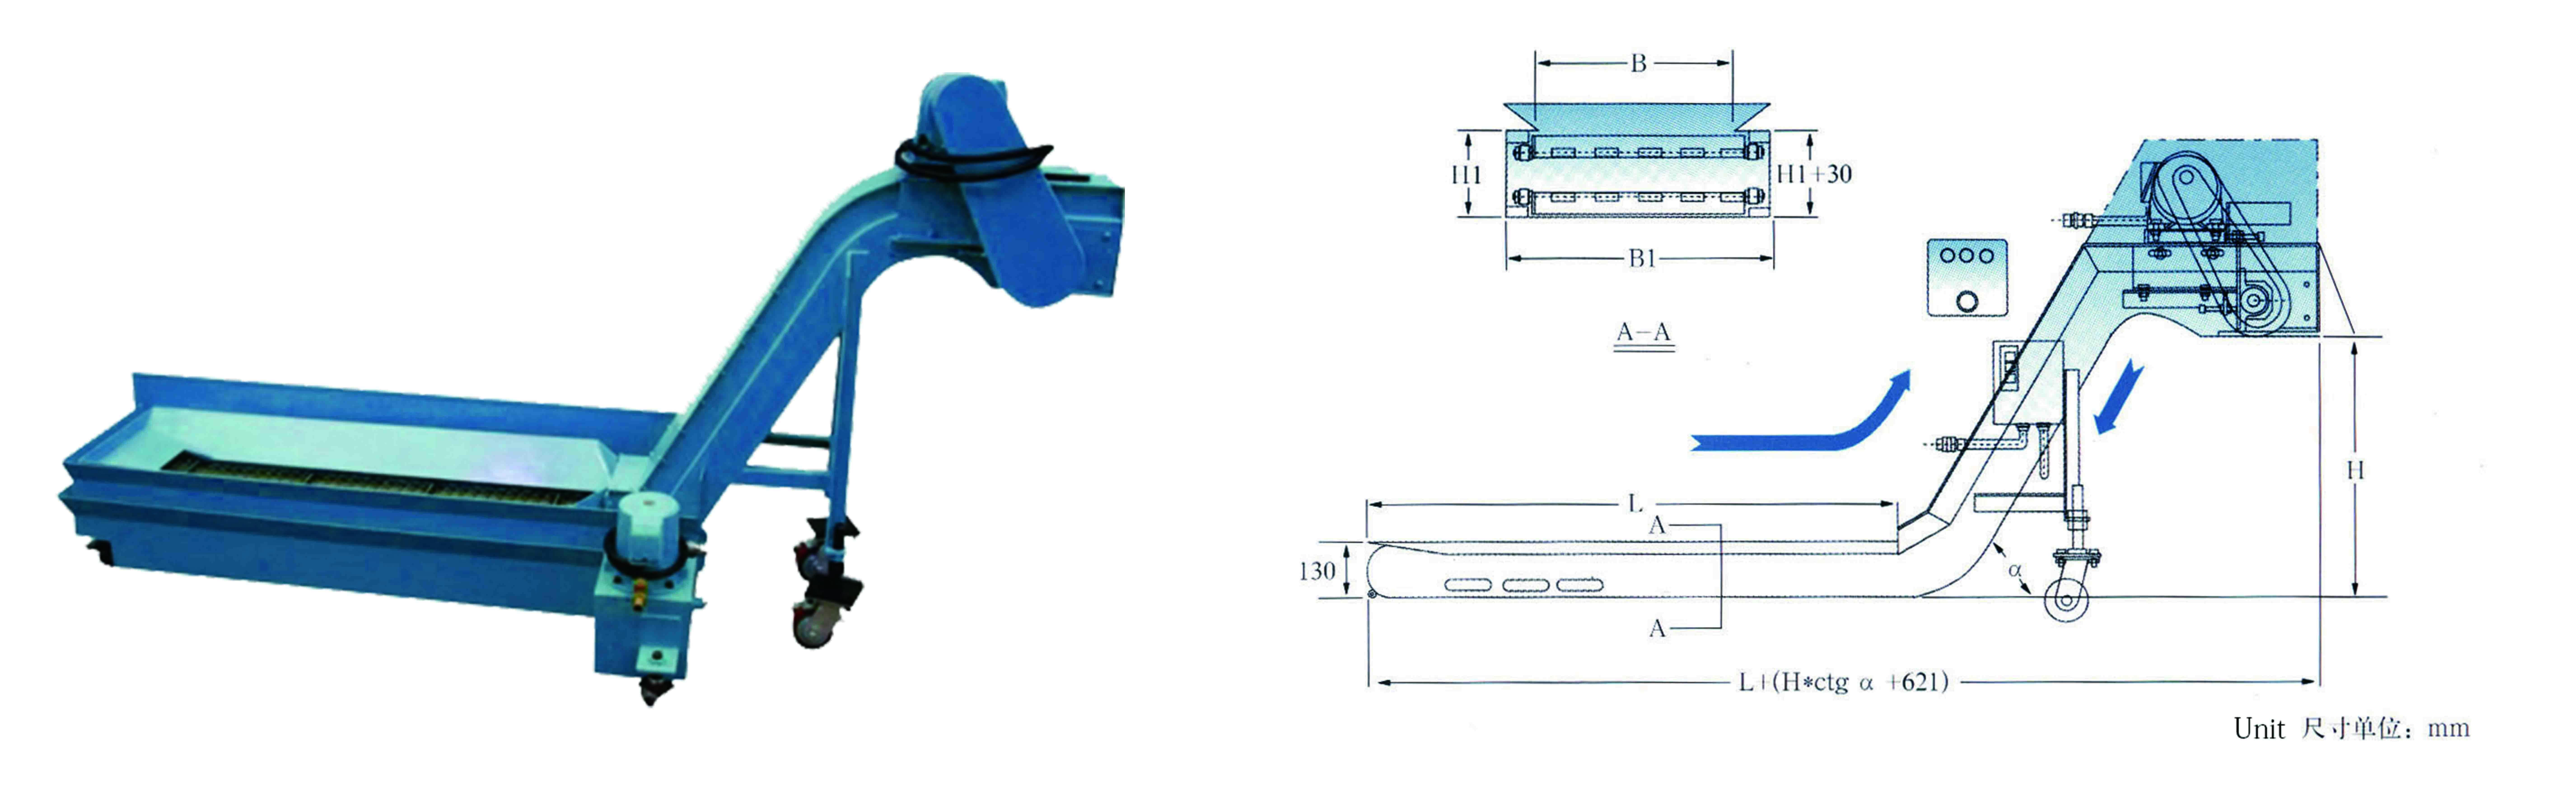 hinge chip conveyor